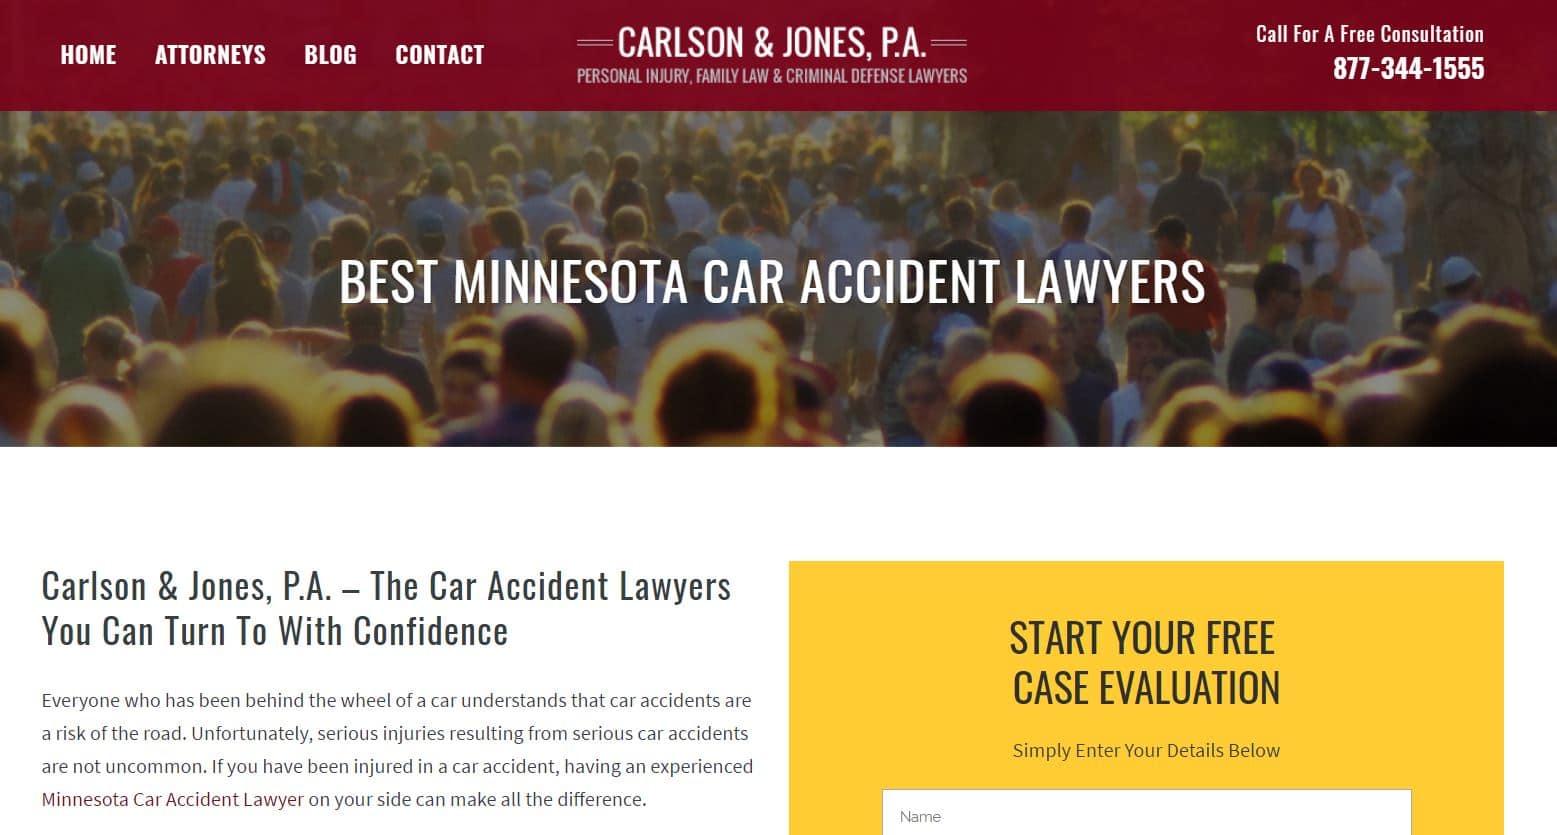 Law Firm Marketing Website Design